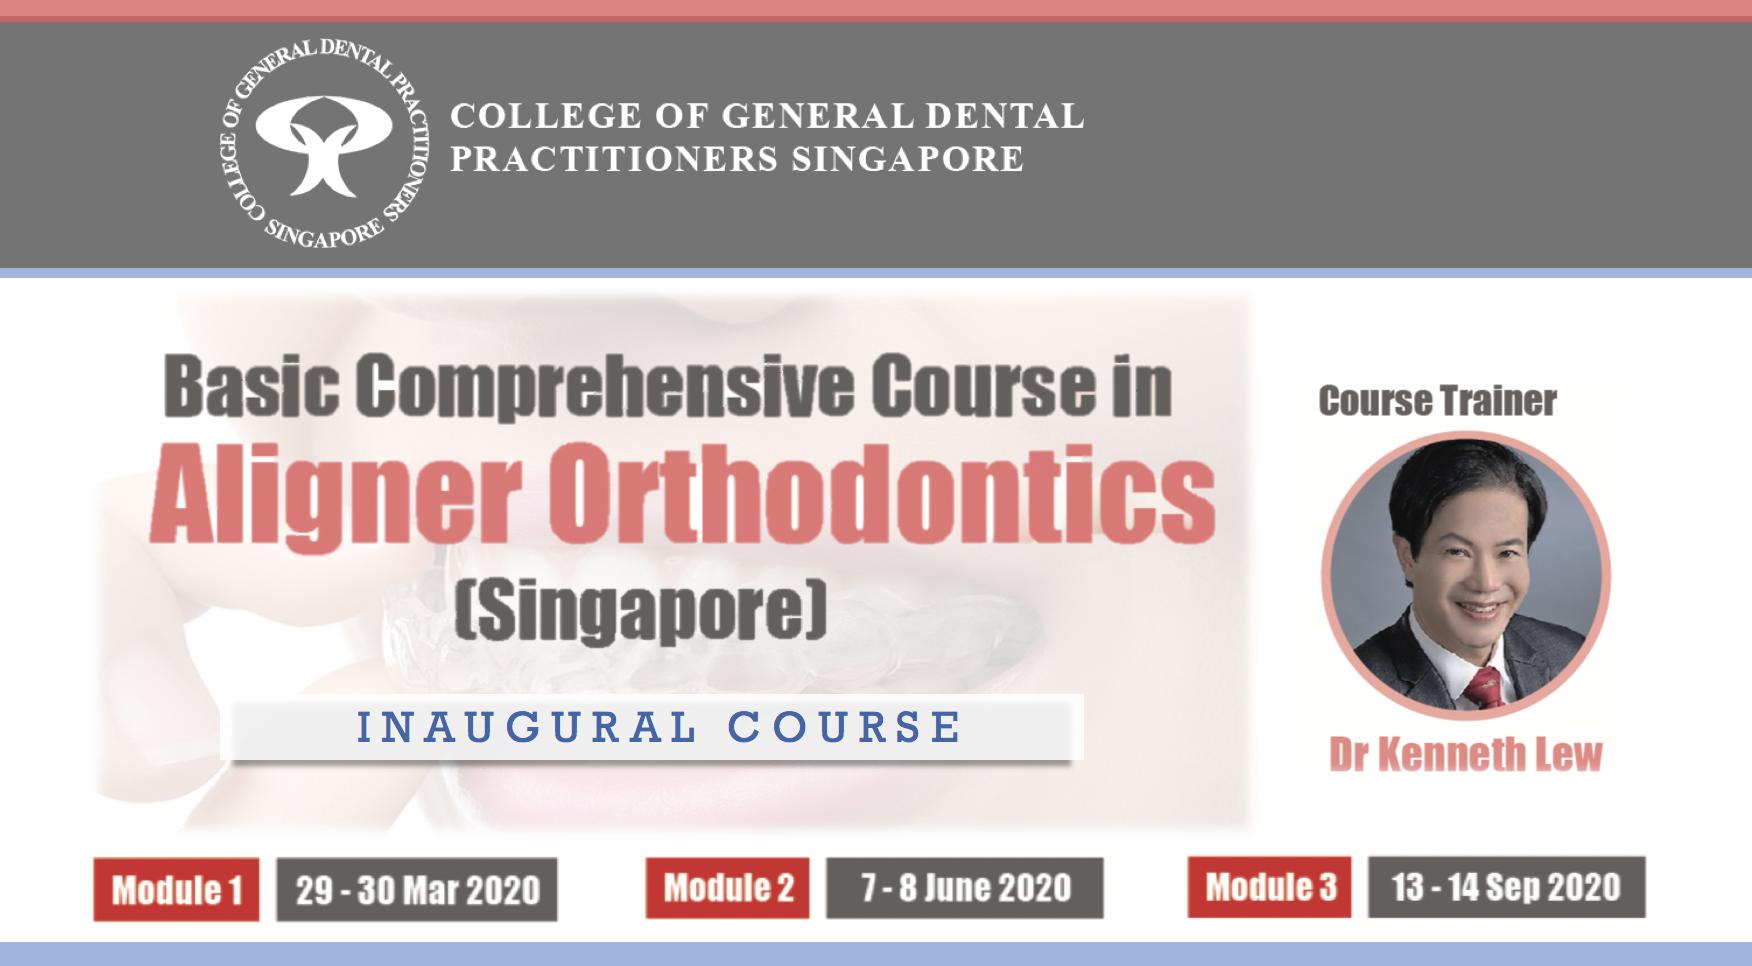 Basic Comprehensive Course in Aligner Orthodontics